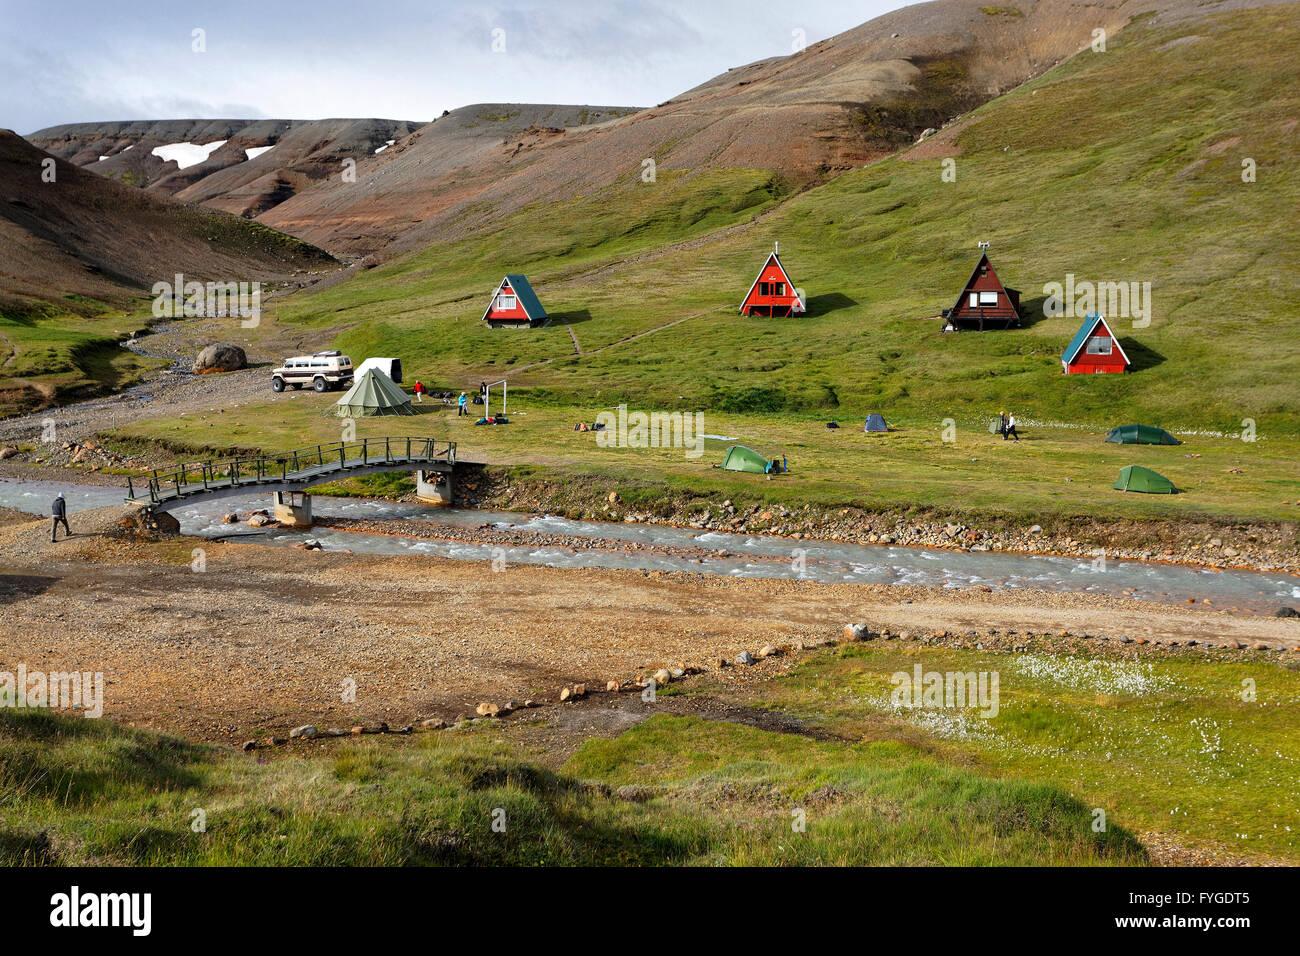 Kjolur campsite, Highlands Iceland - Stock Image